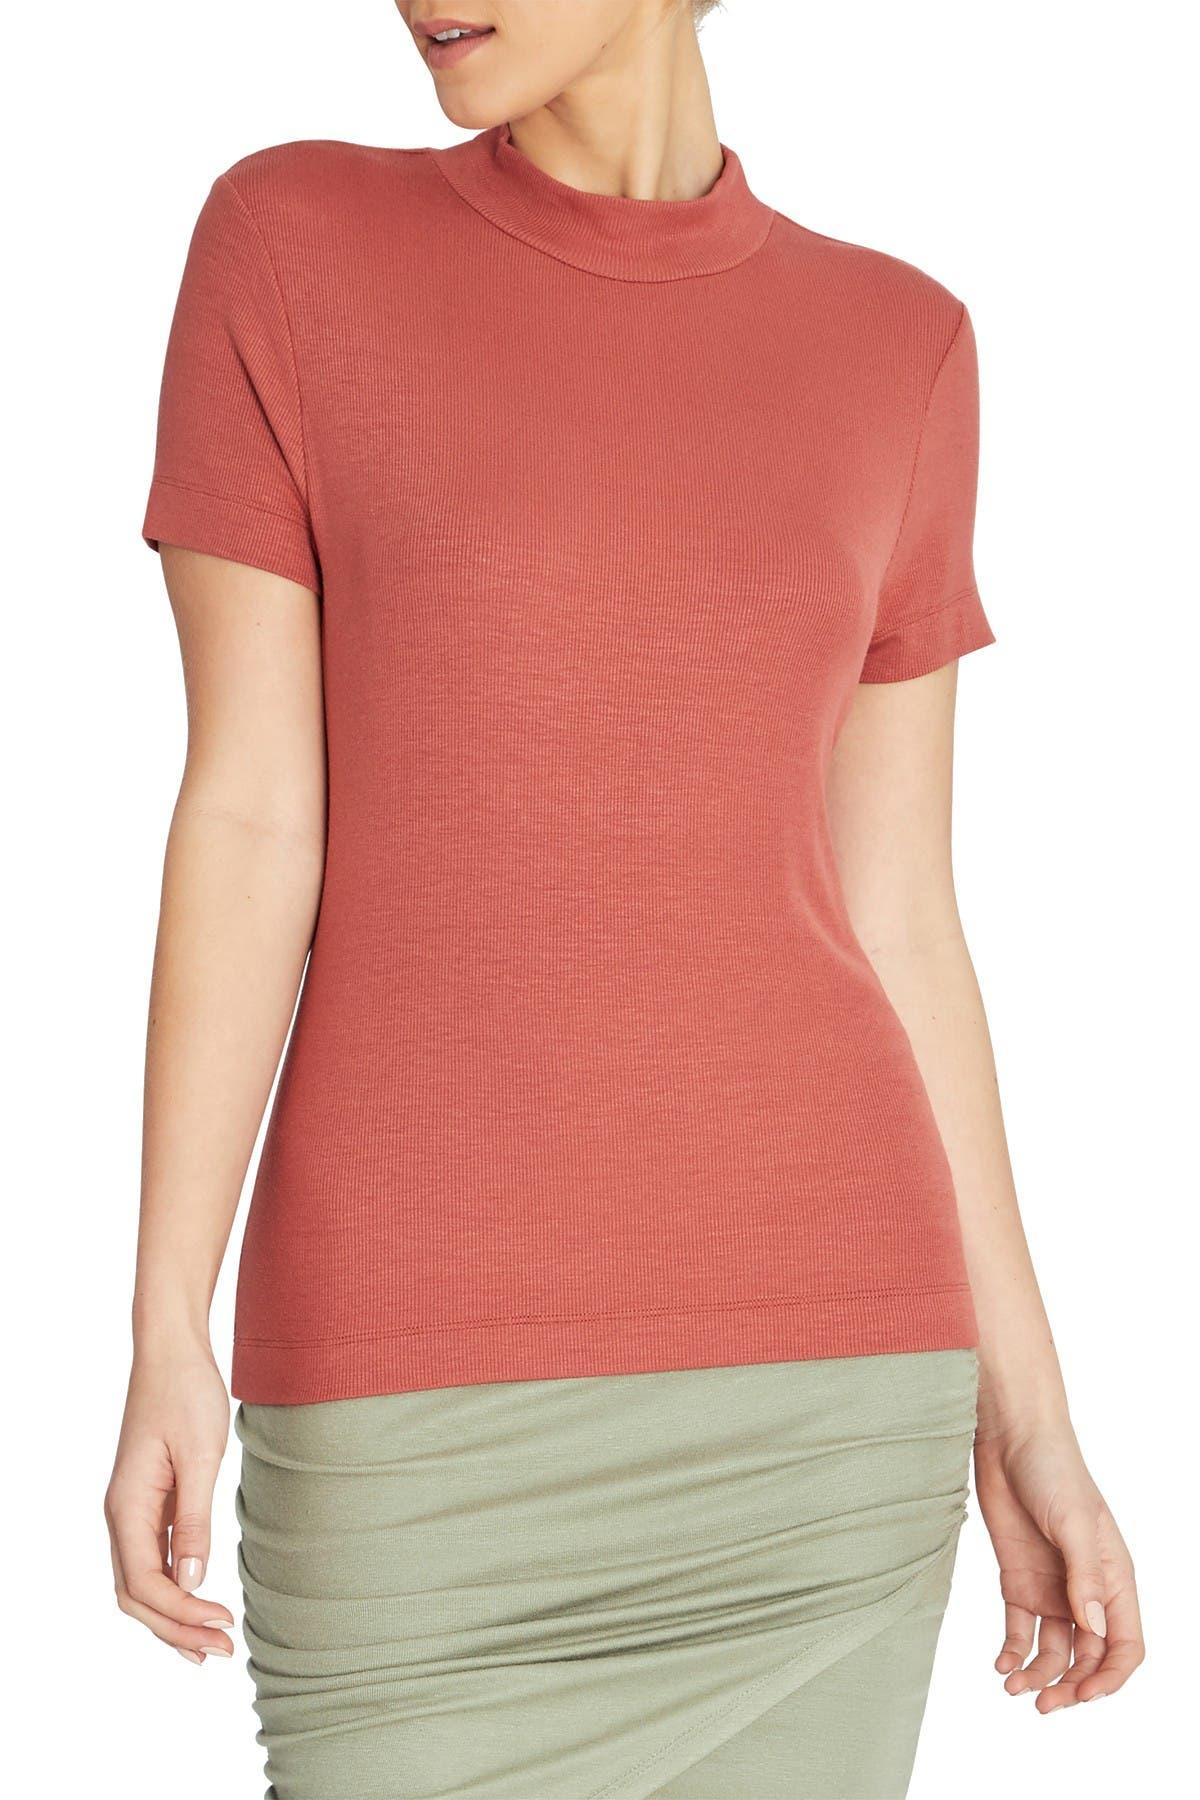 Image of Three Dots Mock Neck Knit Shirt